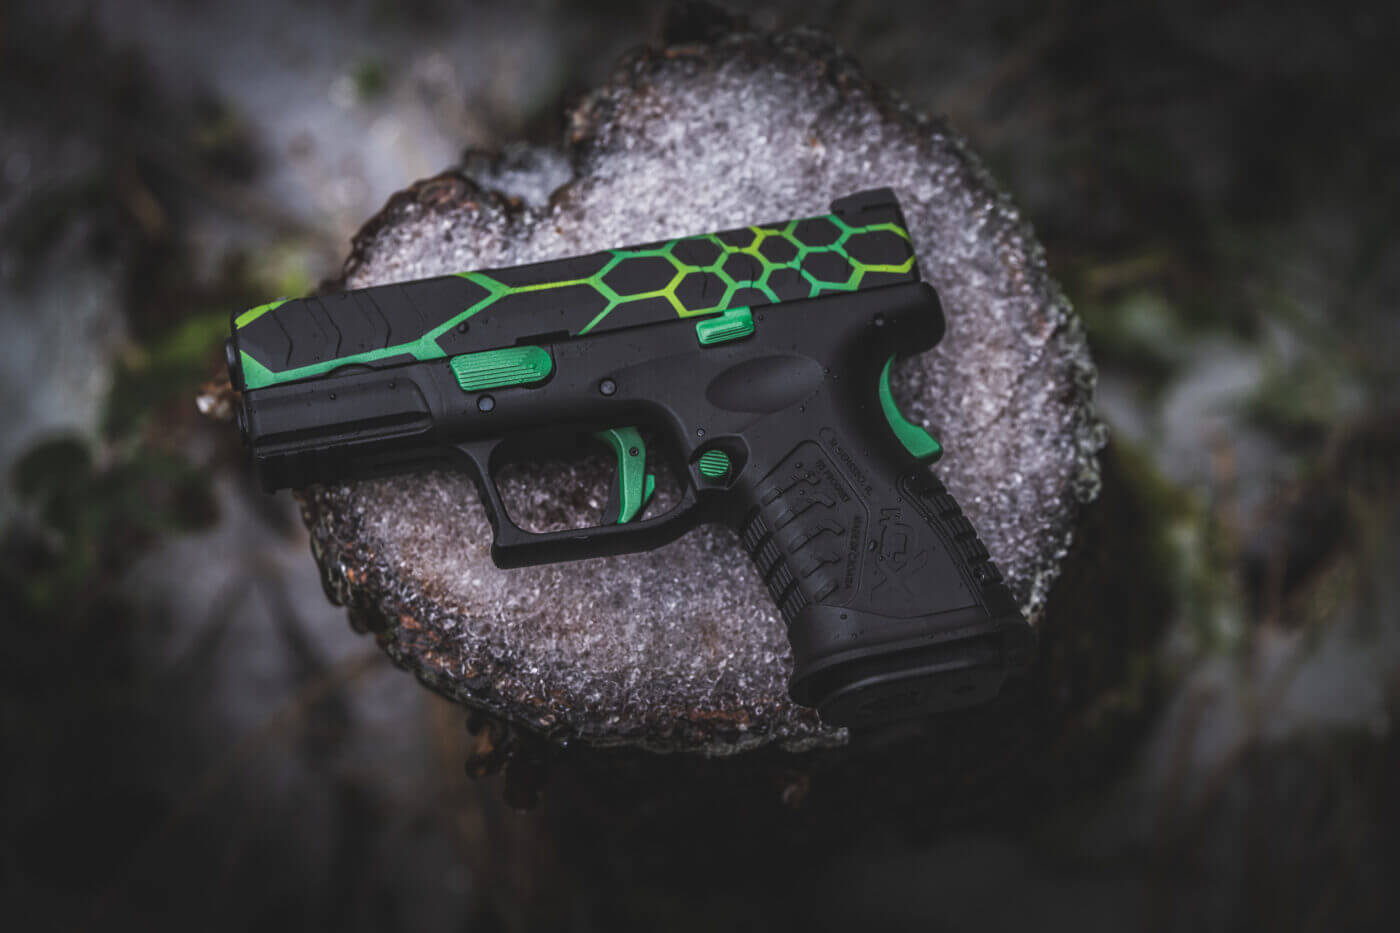 Colored guns